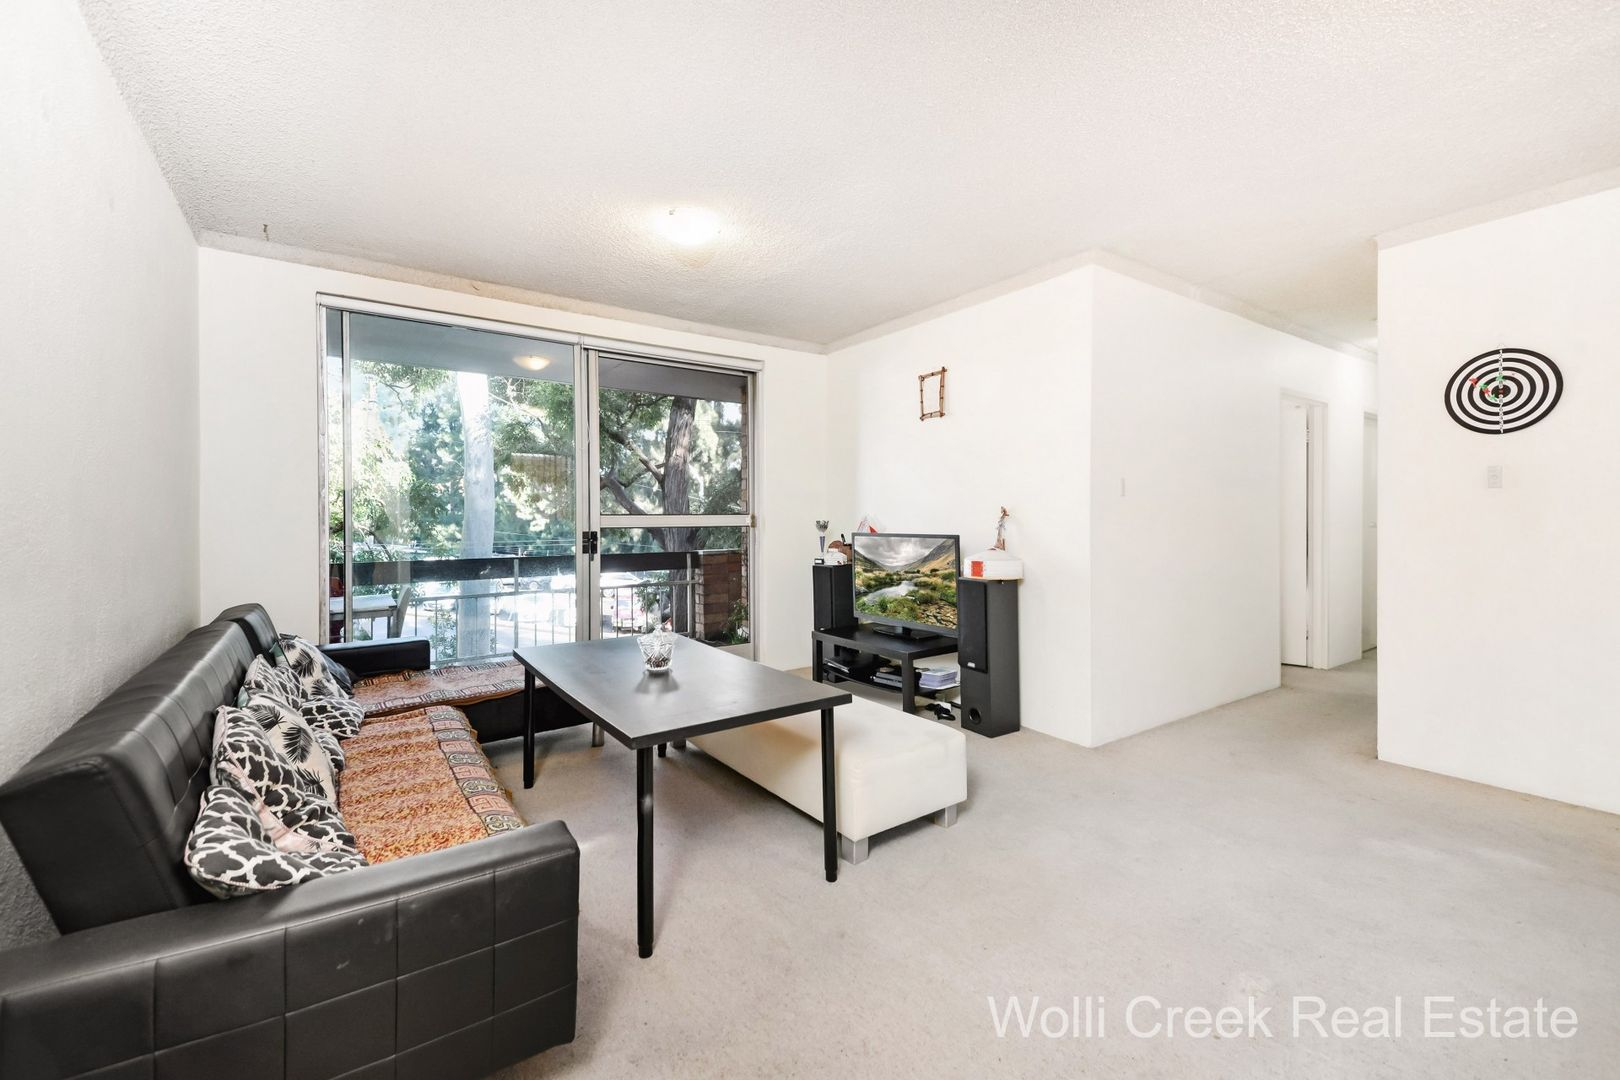 13/23 Ann Street, Wolli Creek NSW 2205, Image 1